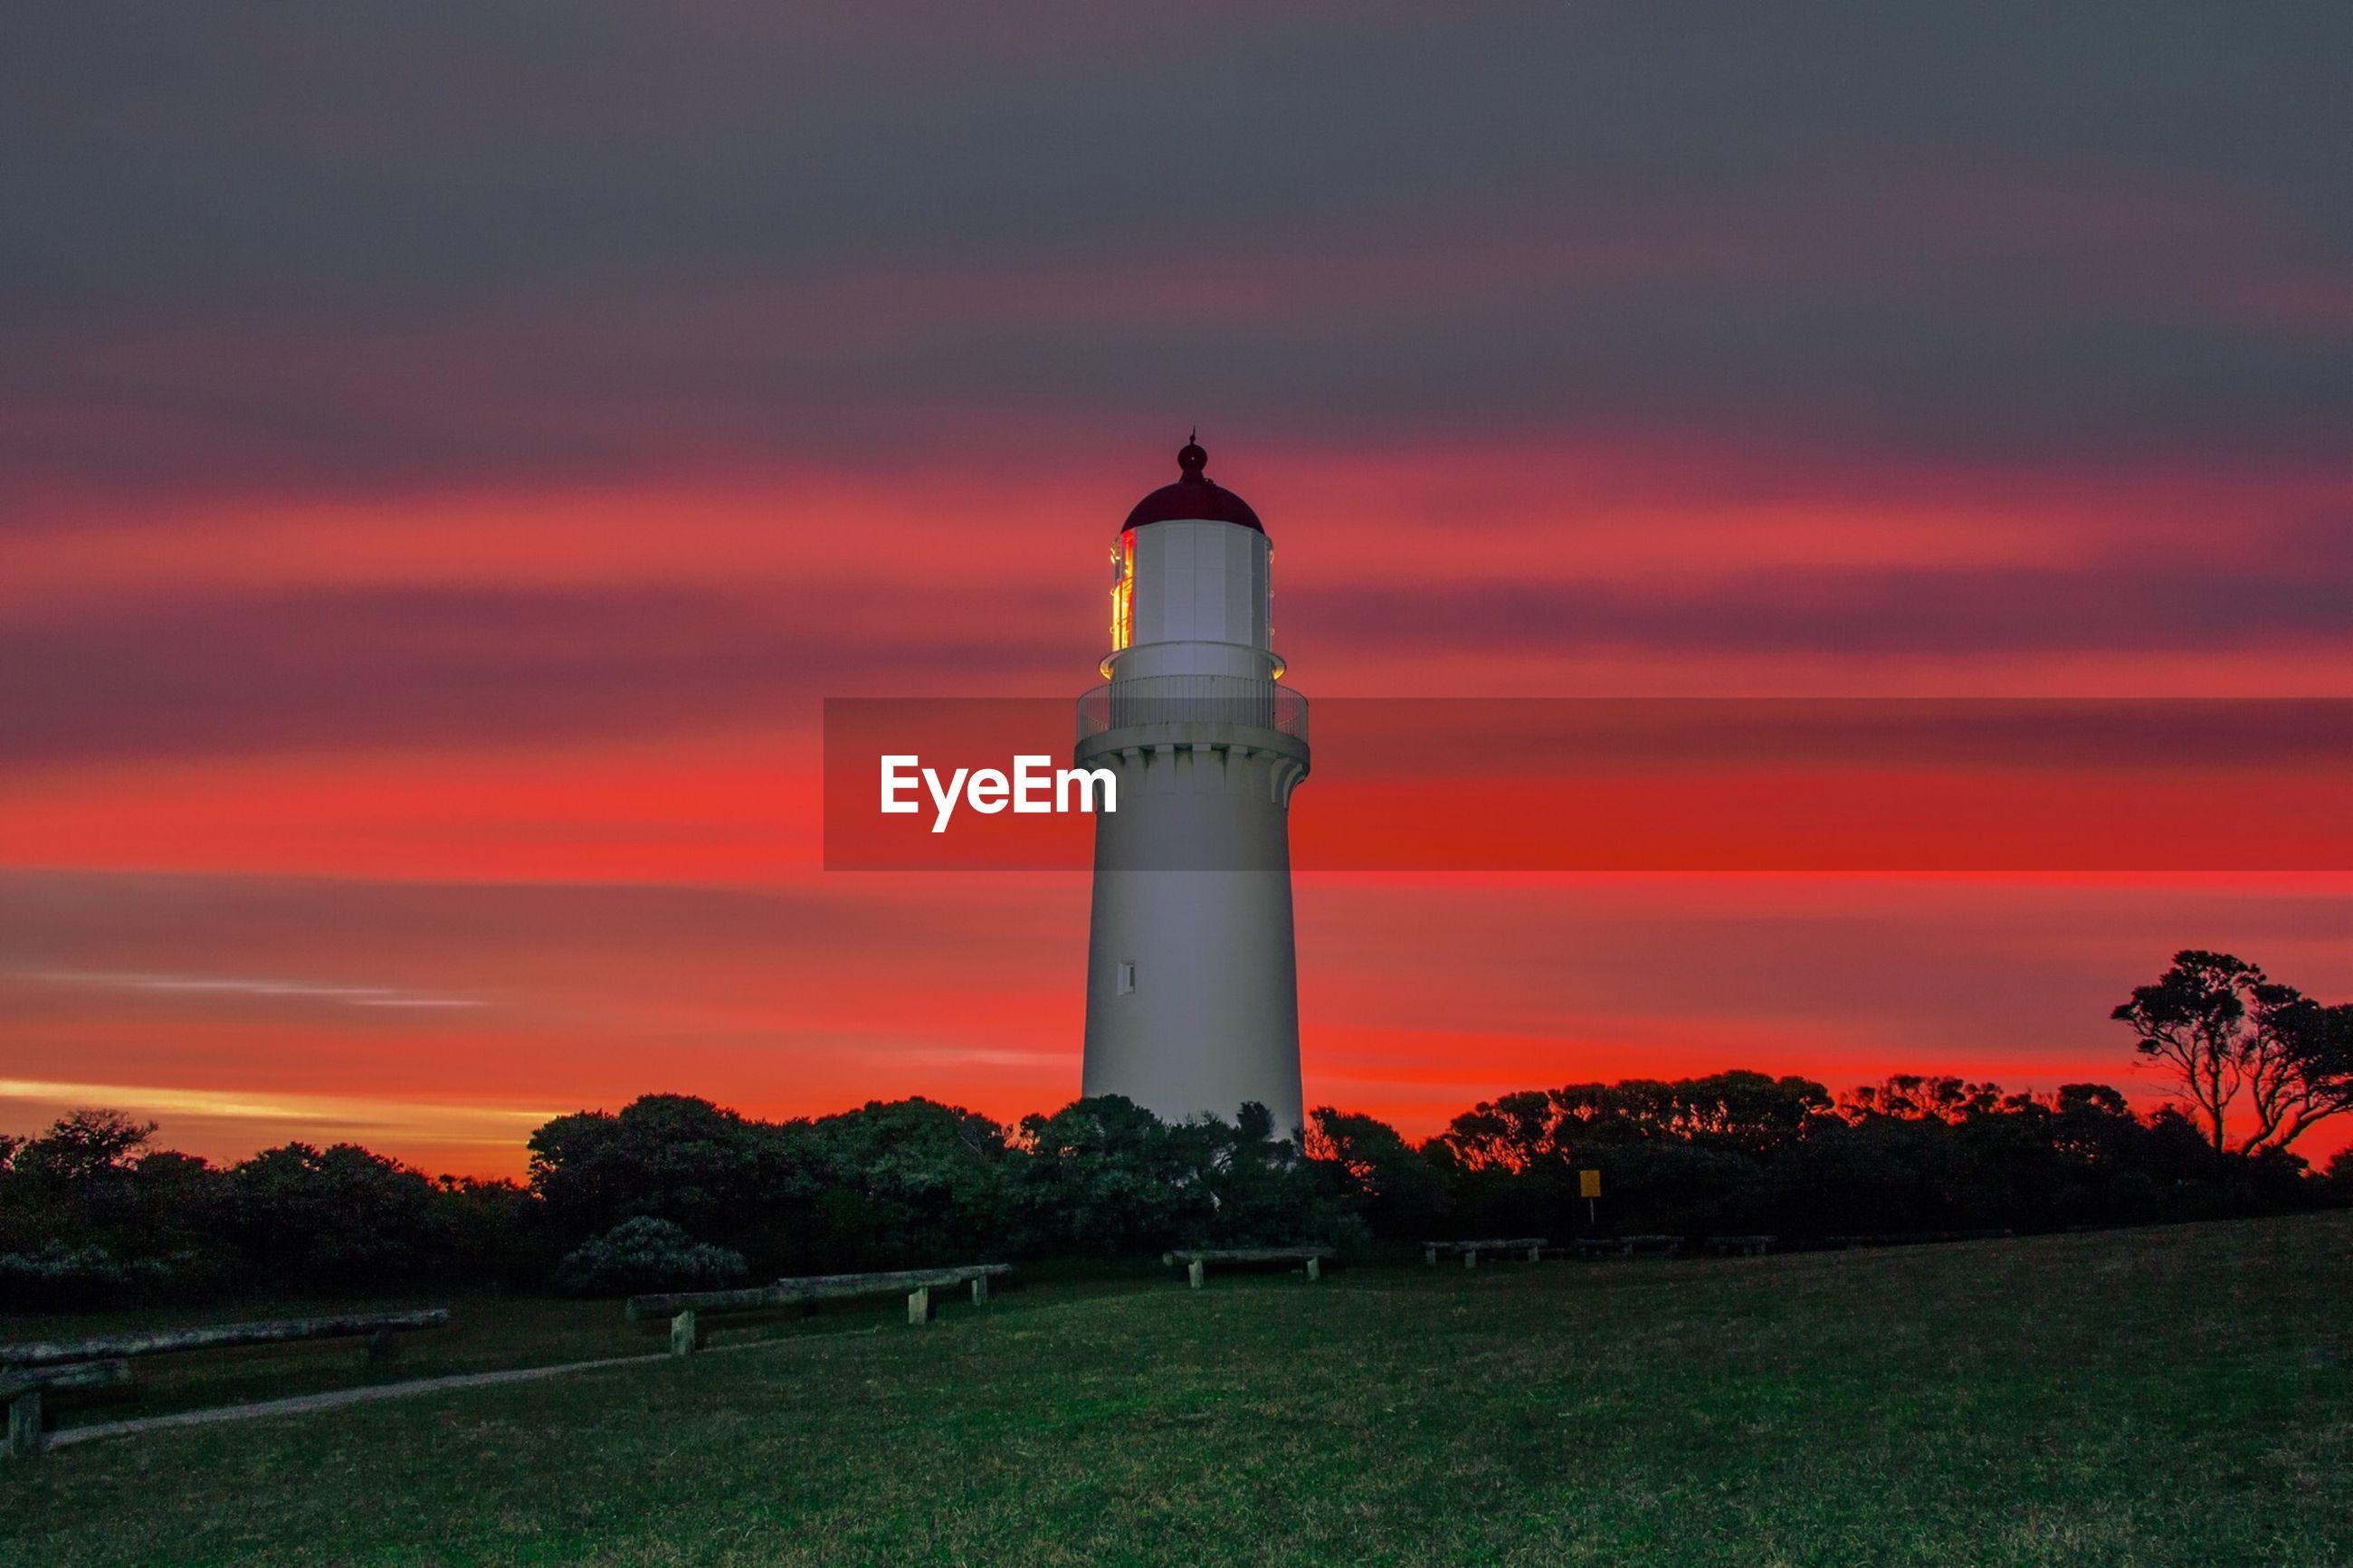 Lighthouse at distance on landscape against sky